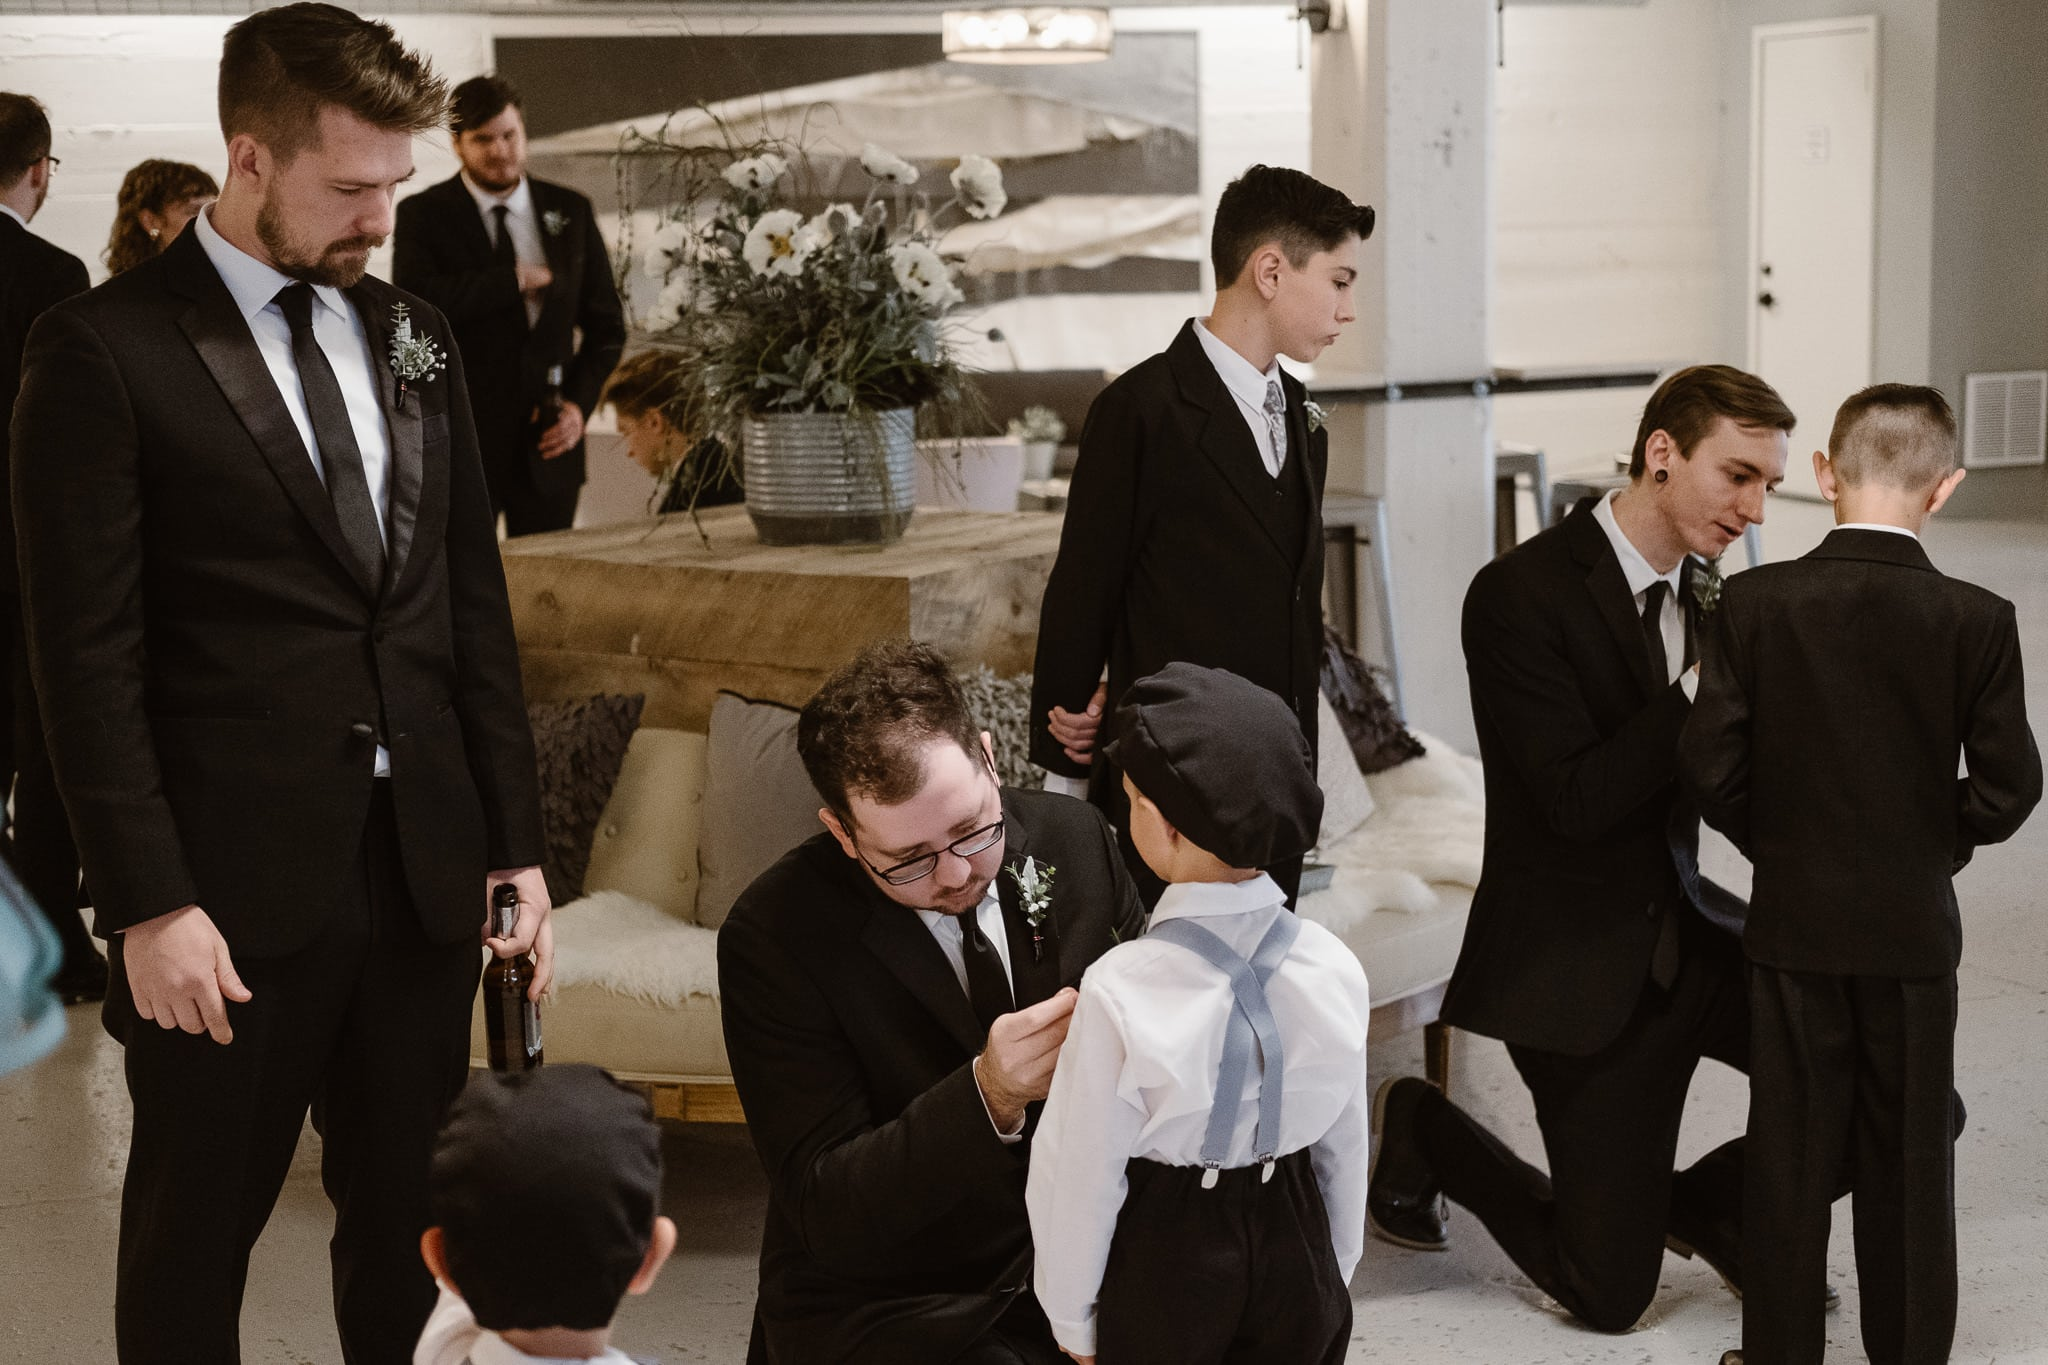 St Vrain Wedding Photographer | Longmont Wedding Photographer | Colorado Winter Wedding Photographer, Colorado industrial chic wedding, groomsmen hanging out